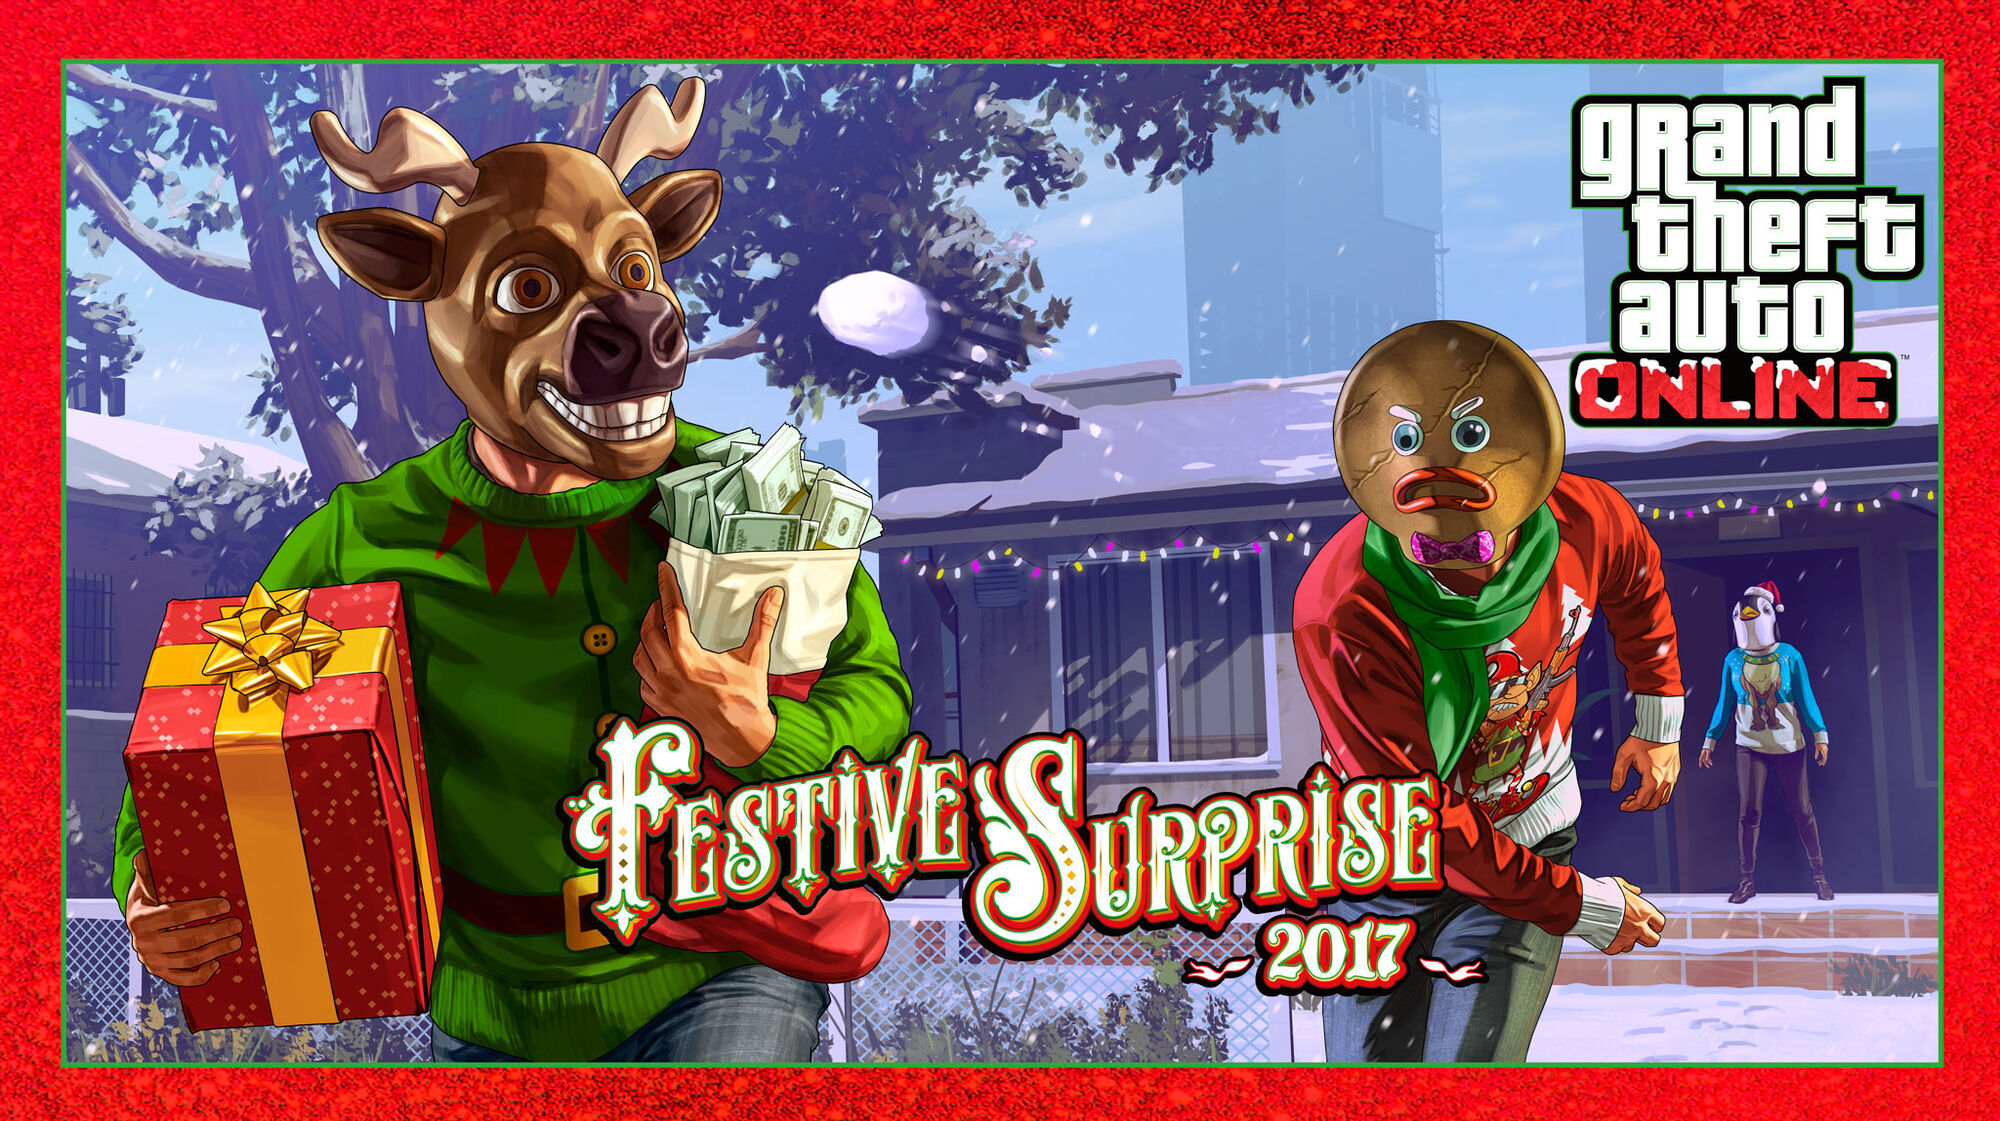 All Christmas Masks Gta Online.Festive Surprise 2017 Gta Wiki Fandom Powered By Wikia